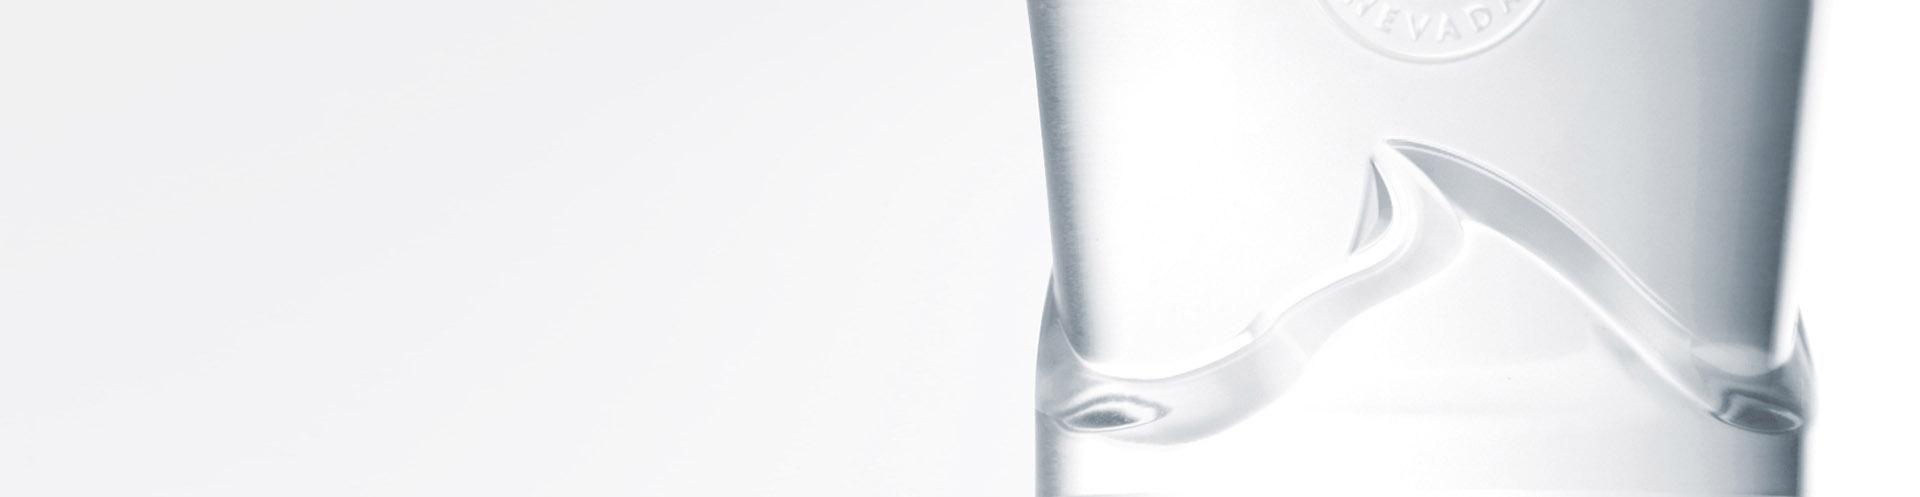 Design detail of the PET bottle.